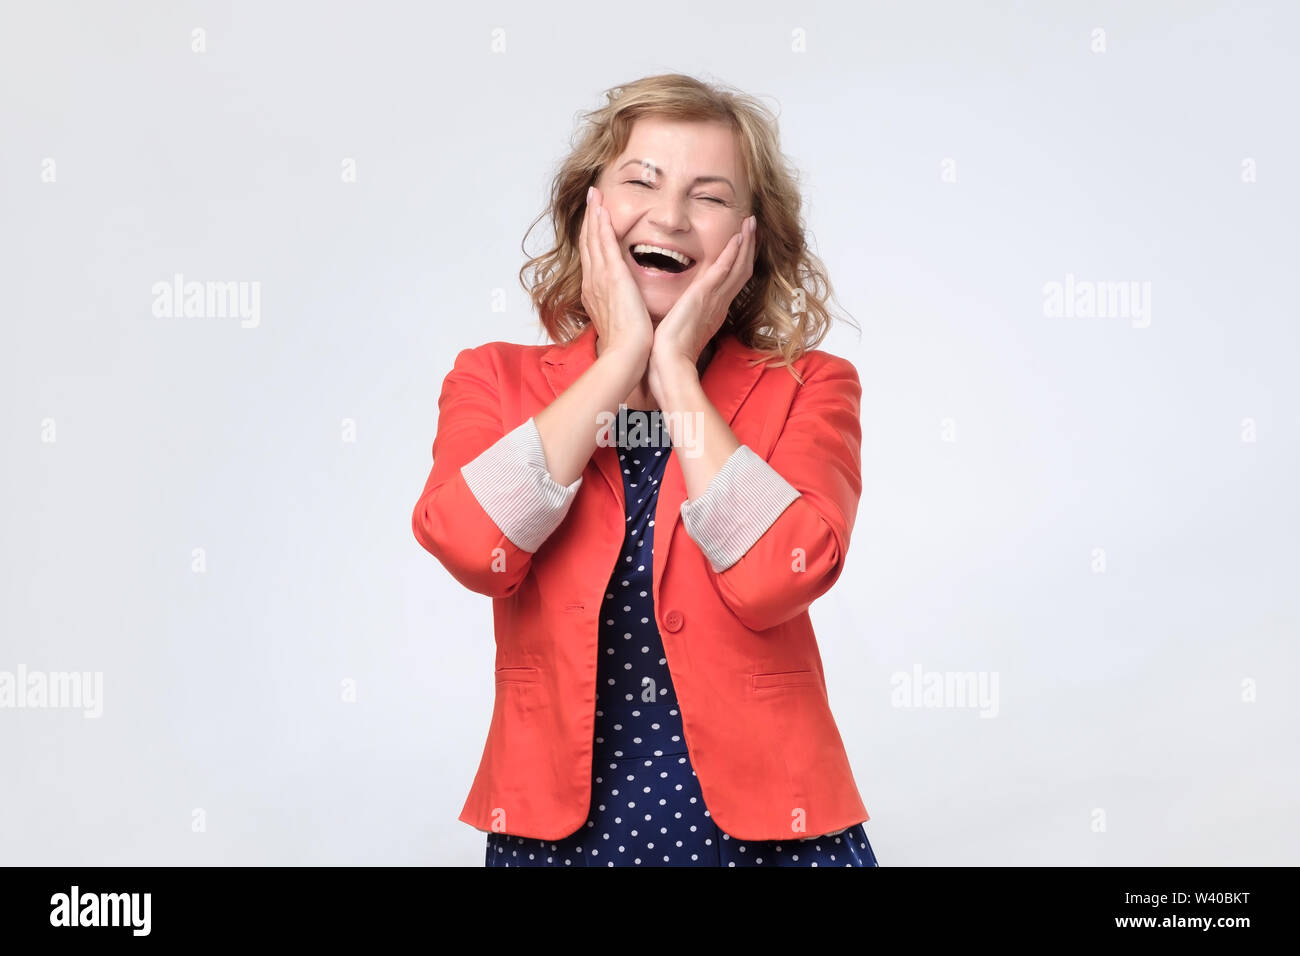 Mature happy woman laughing loudly on joke. - Stock Image